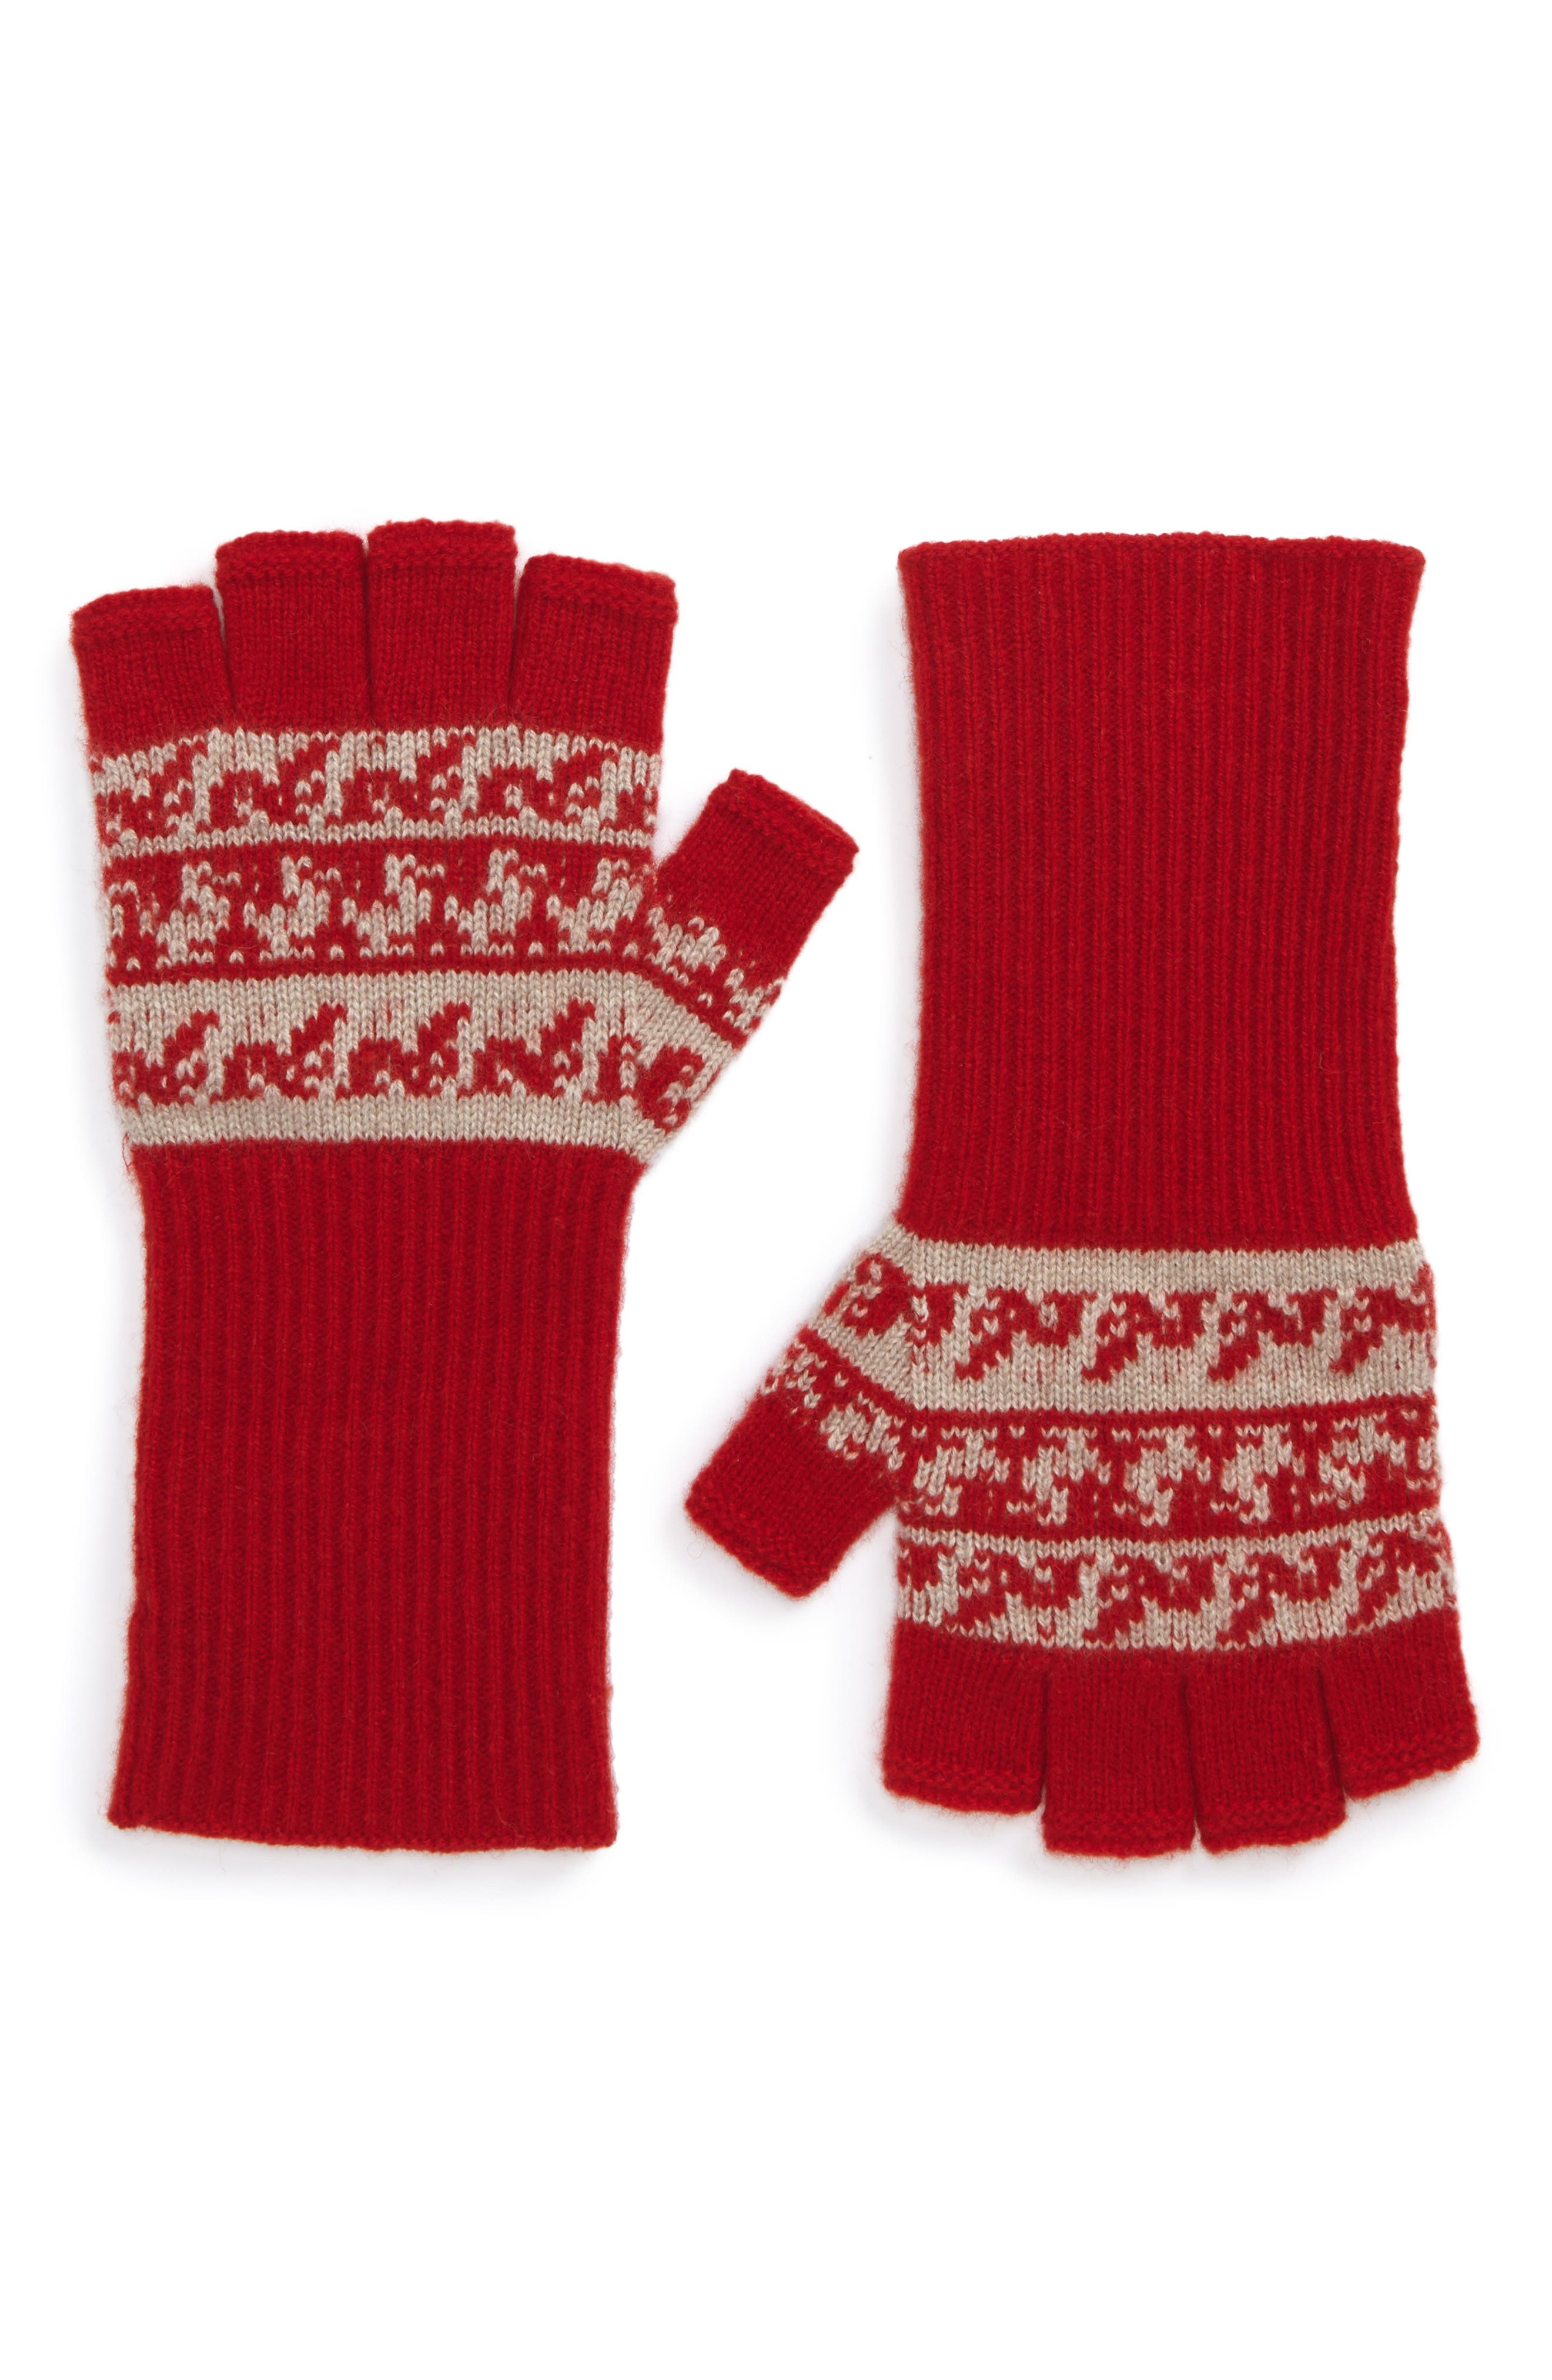 Burberry Fair Isle Cashmere & Wool Fingerless Gloves | Nordstrom